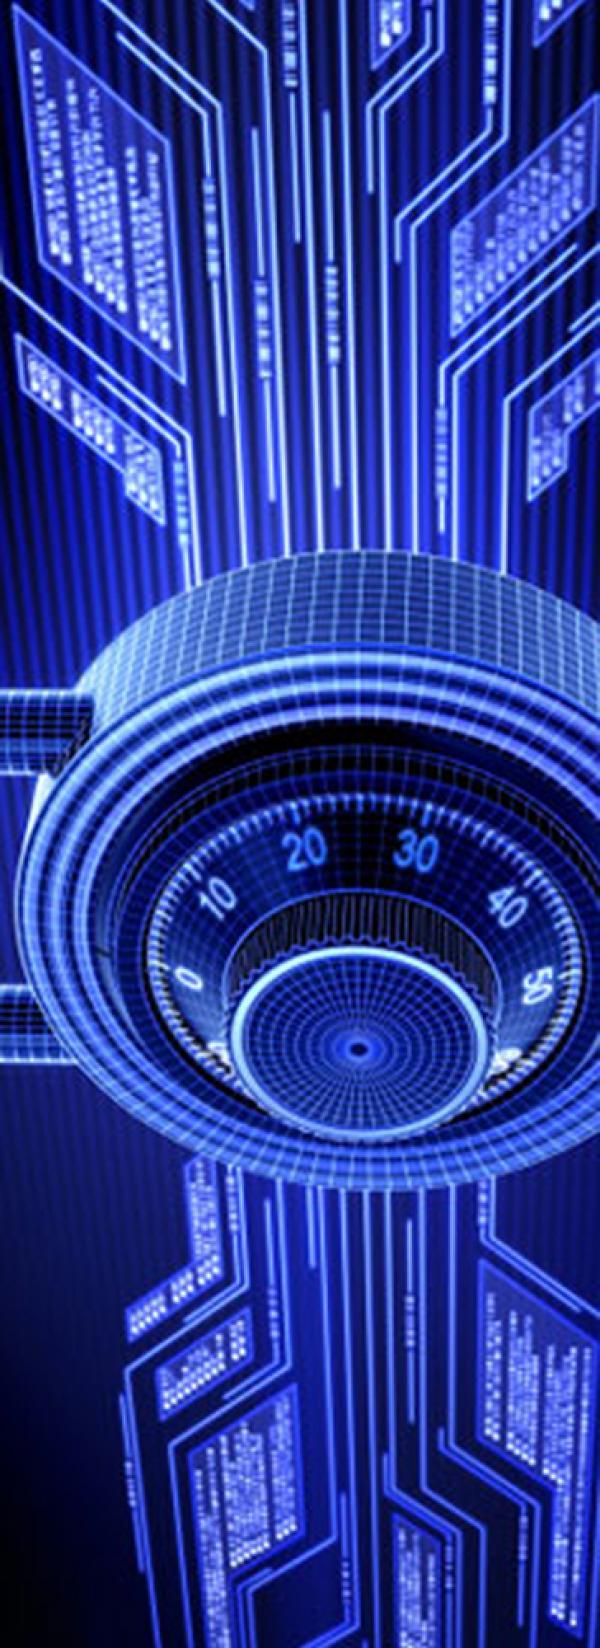 Cyberoam Certified Network Security Professional @ Regolina